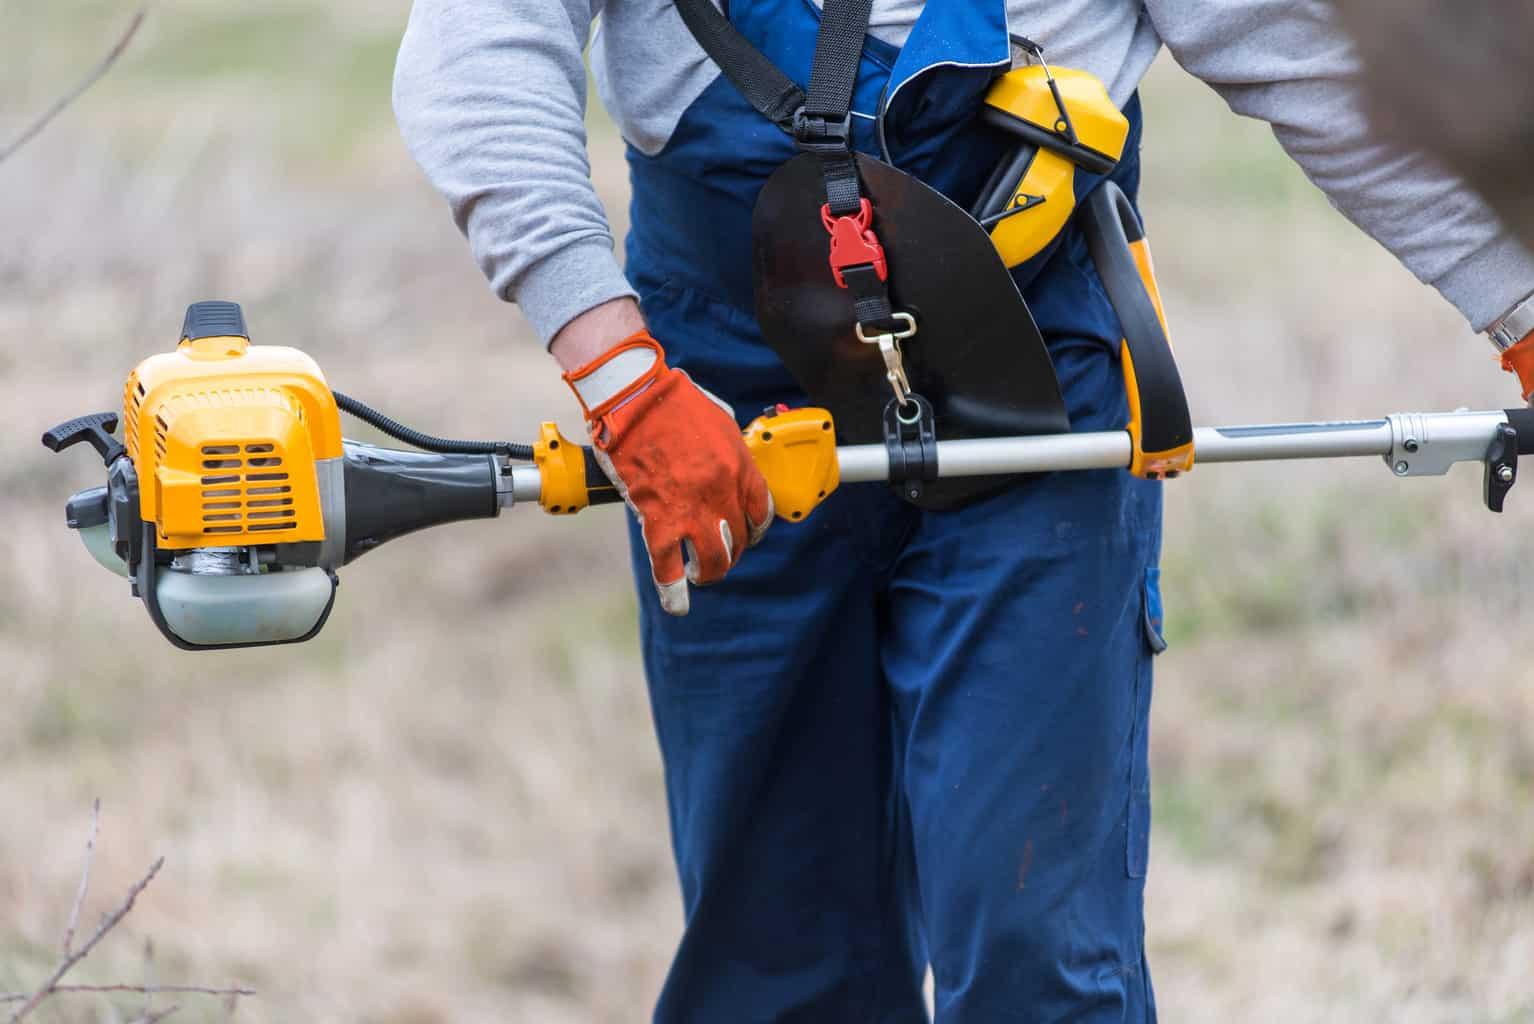 A man holding a gas powered pole saw